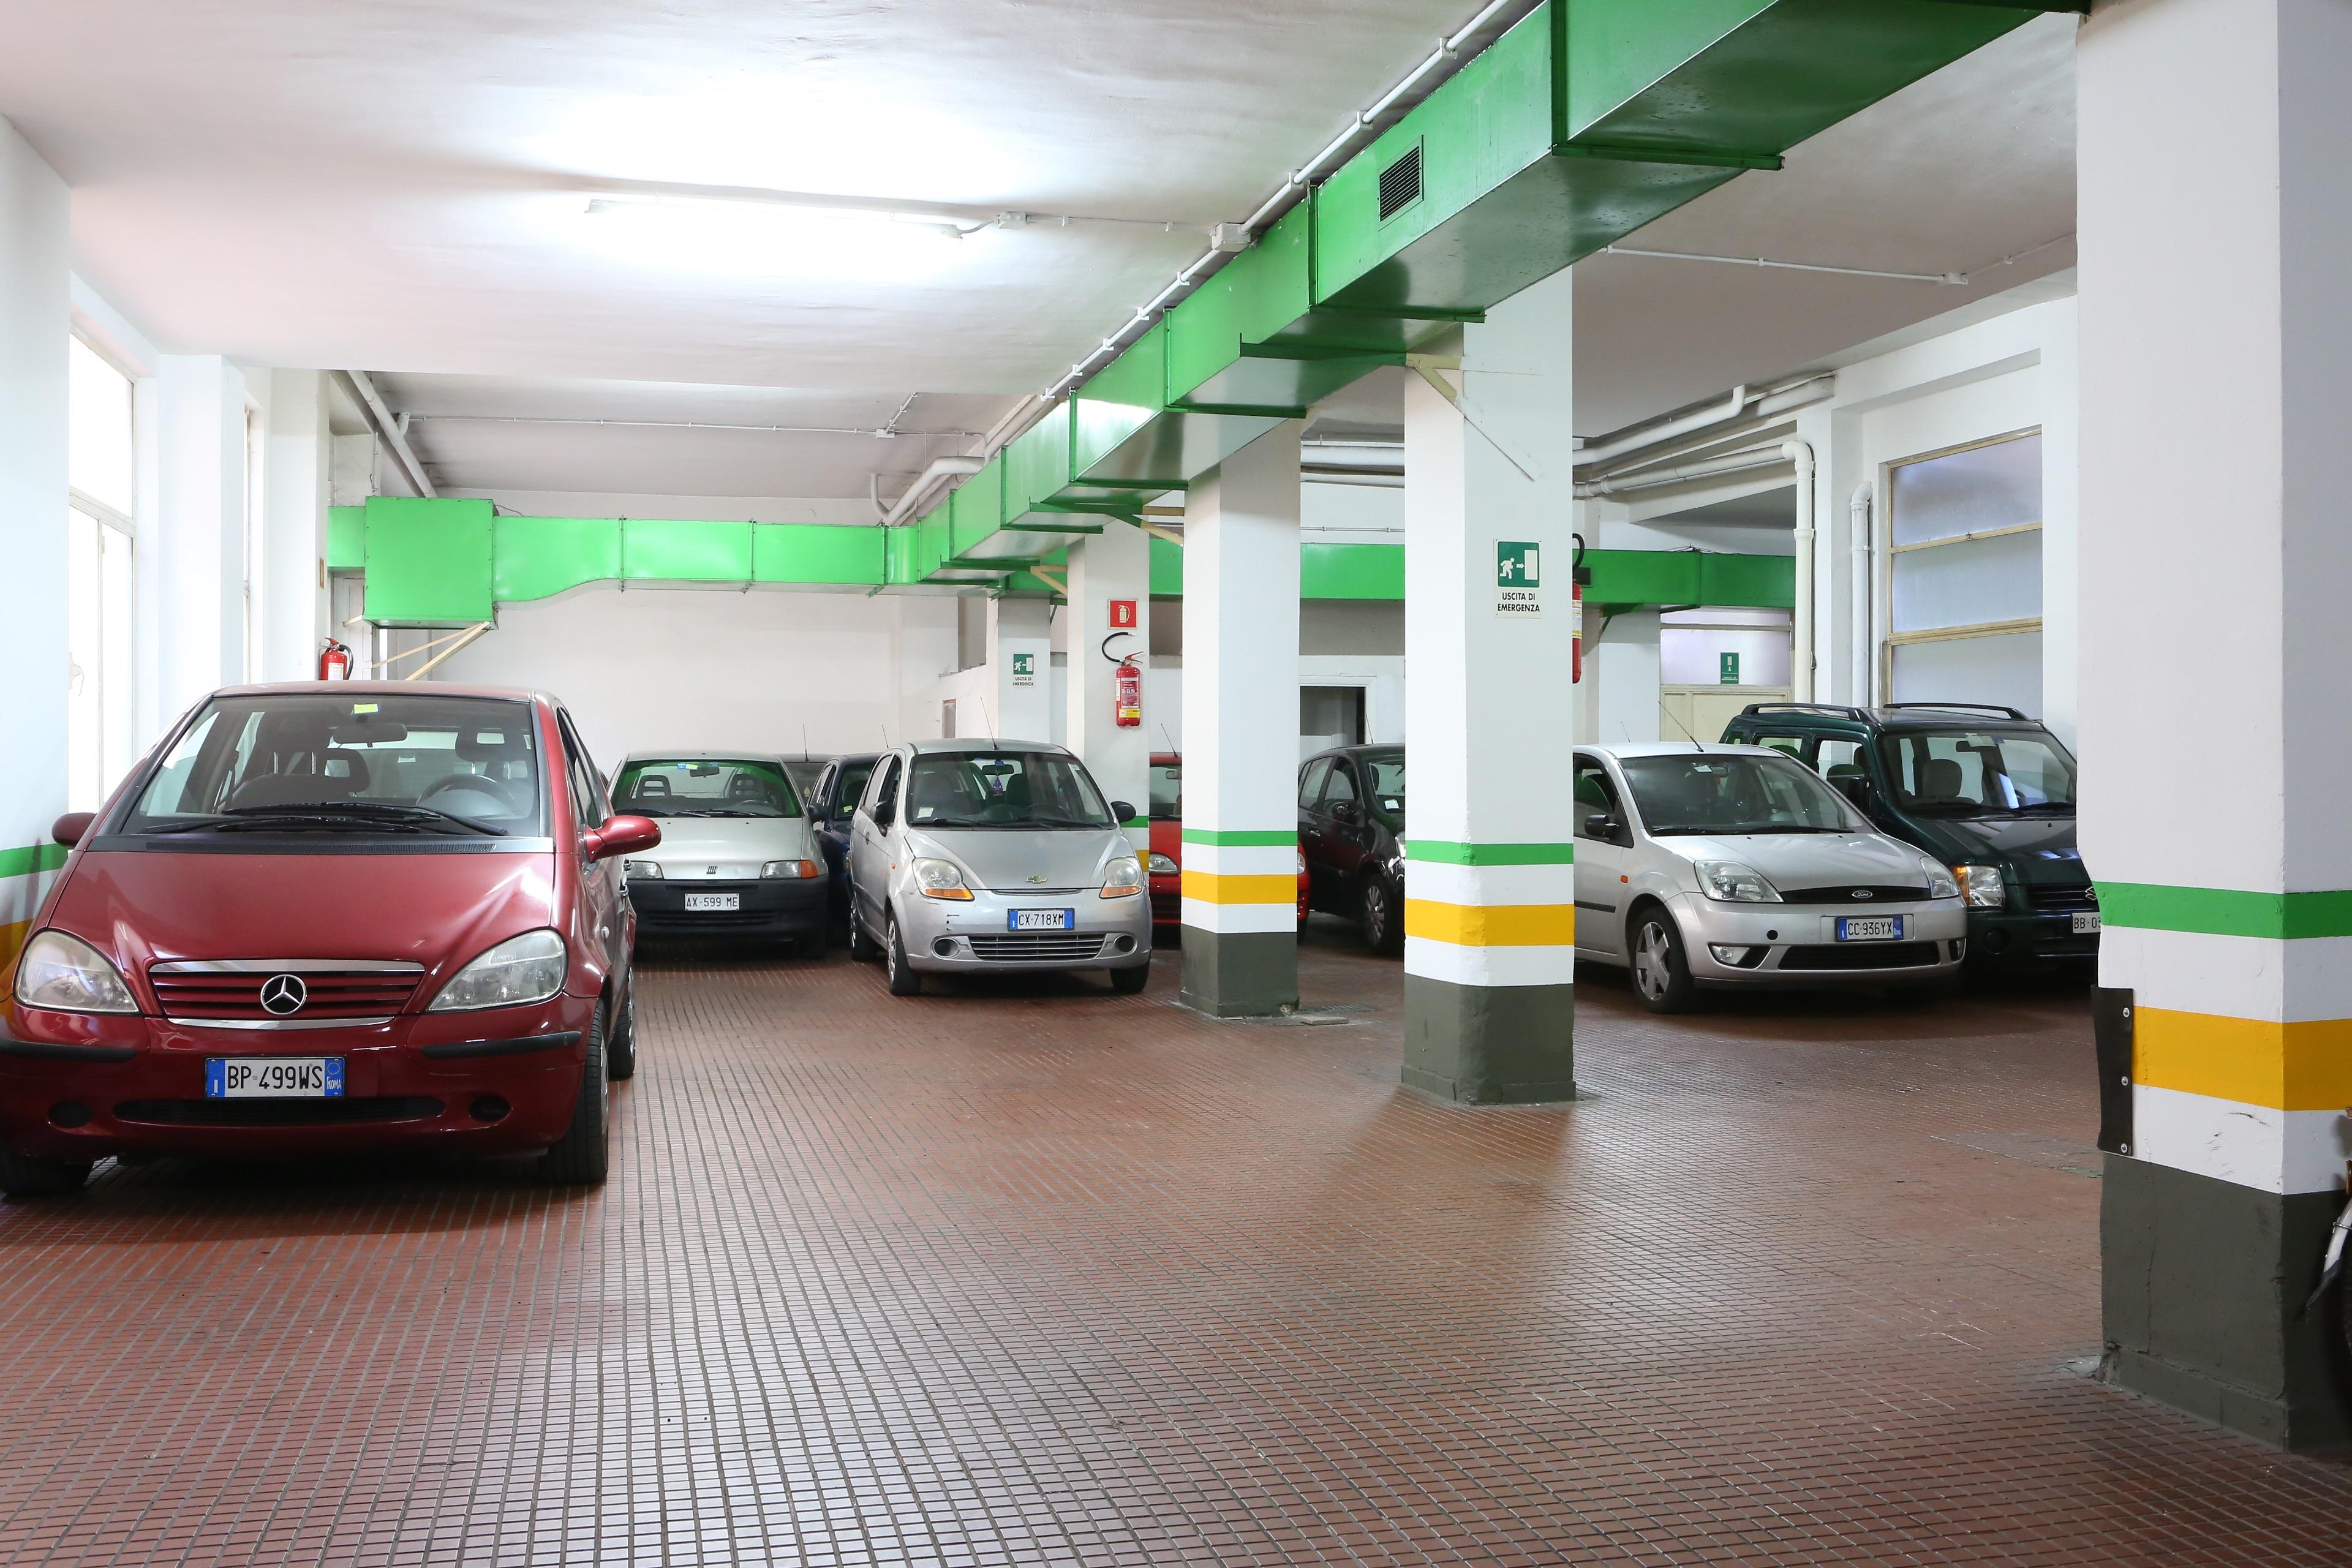 Garage centrale roma valle aurelia parkvia for Entrata del mudroom dal garage